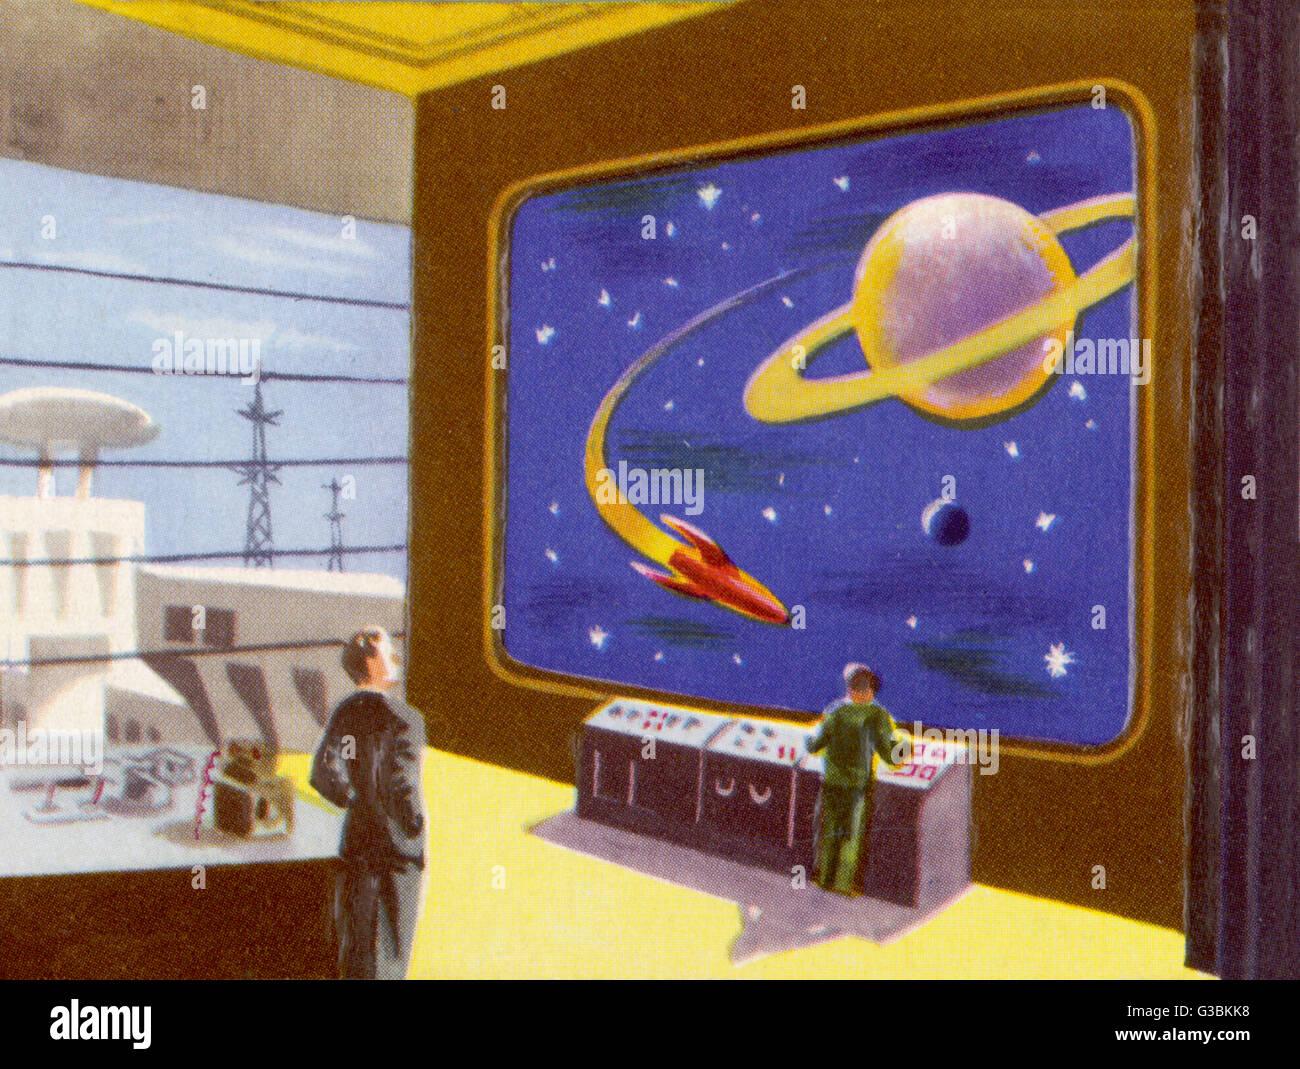 INTERPLANETARY TELEVISION         Date: circa 1950 - Stock Image